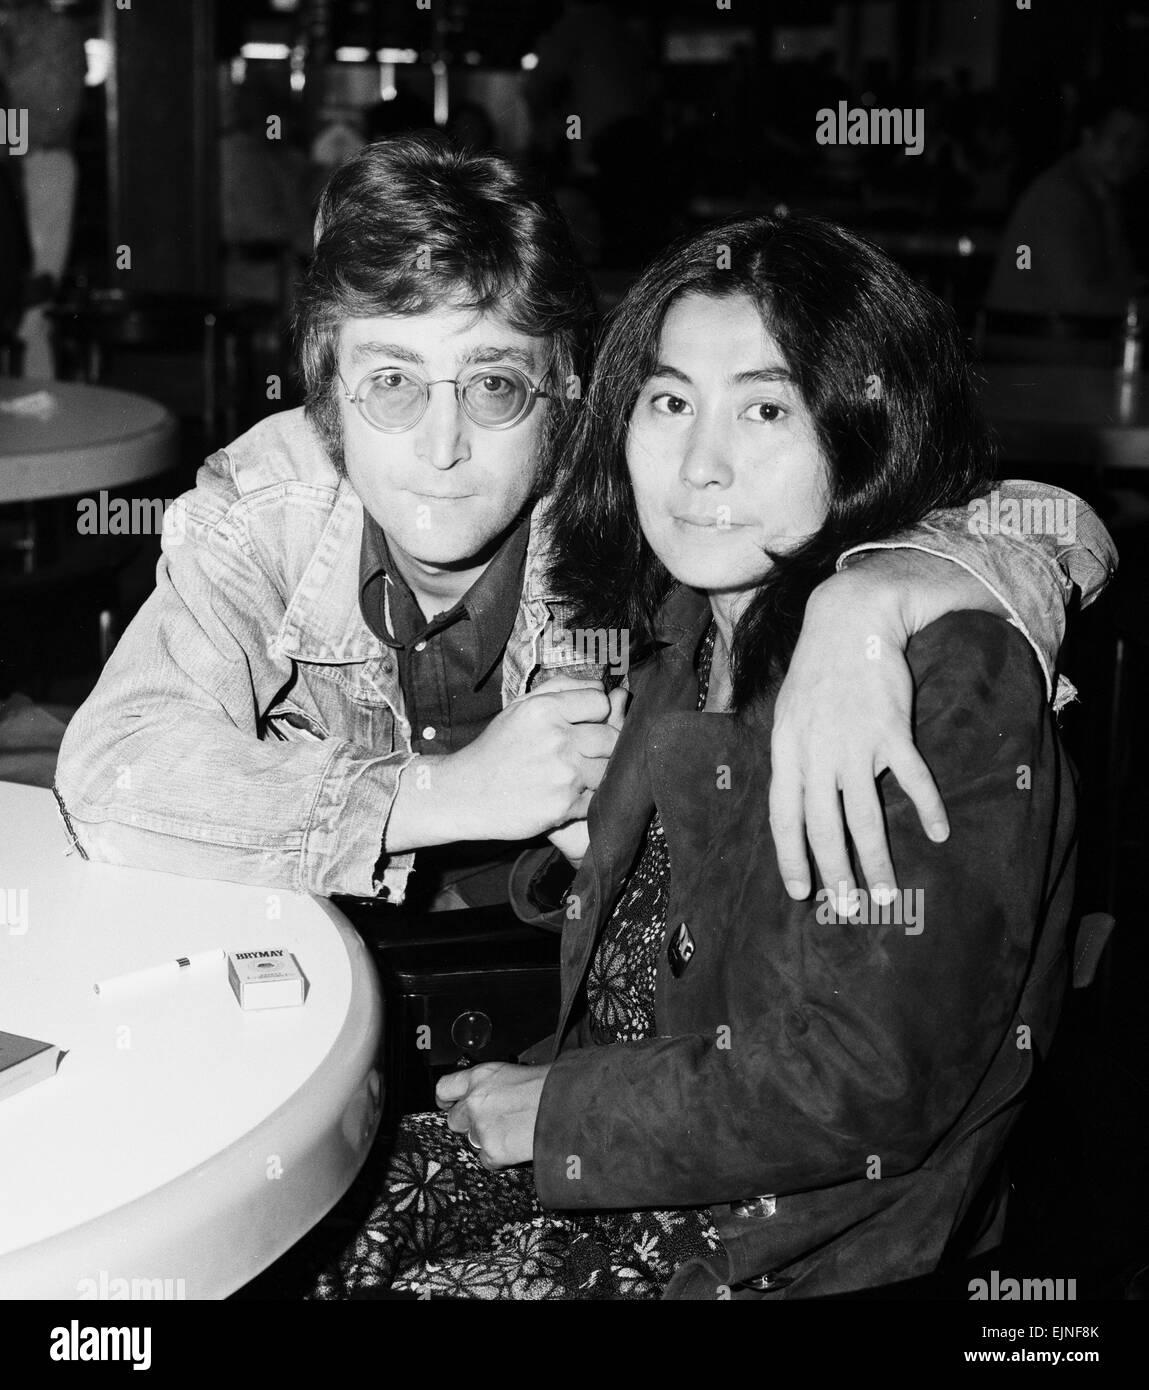 Former Beatle John Lennon With His Wife Yoko Ono Leaving Heathrow Stock Photo Alamy